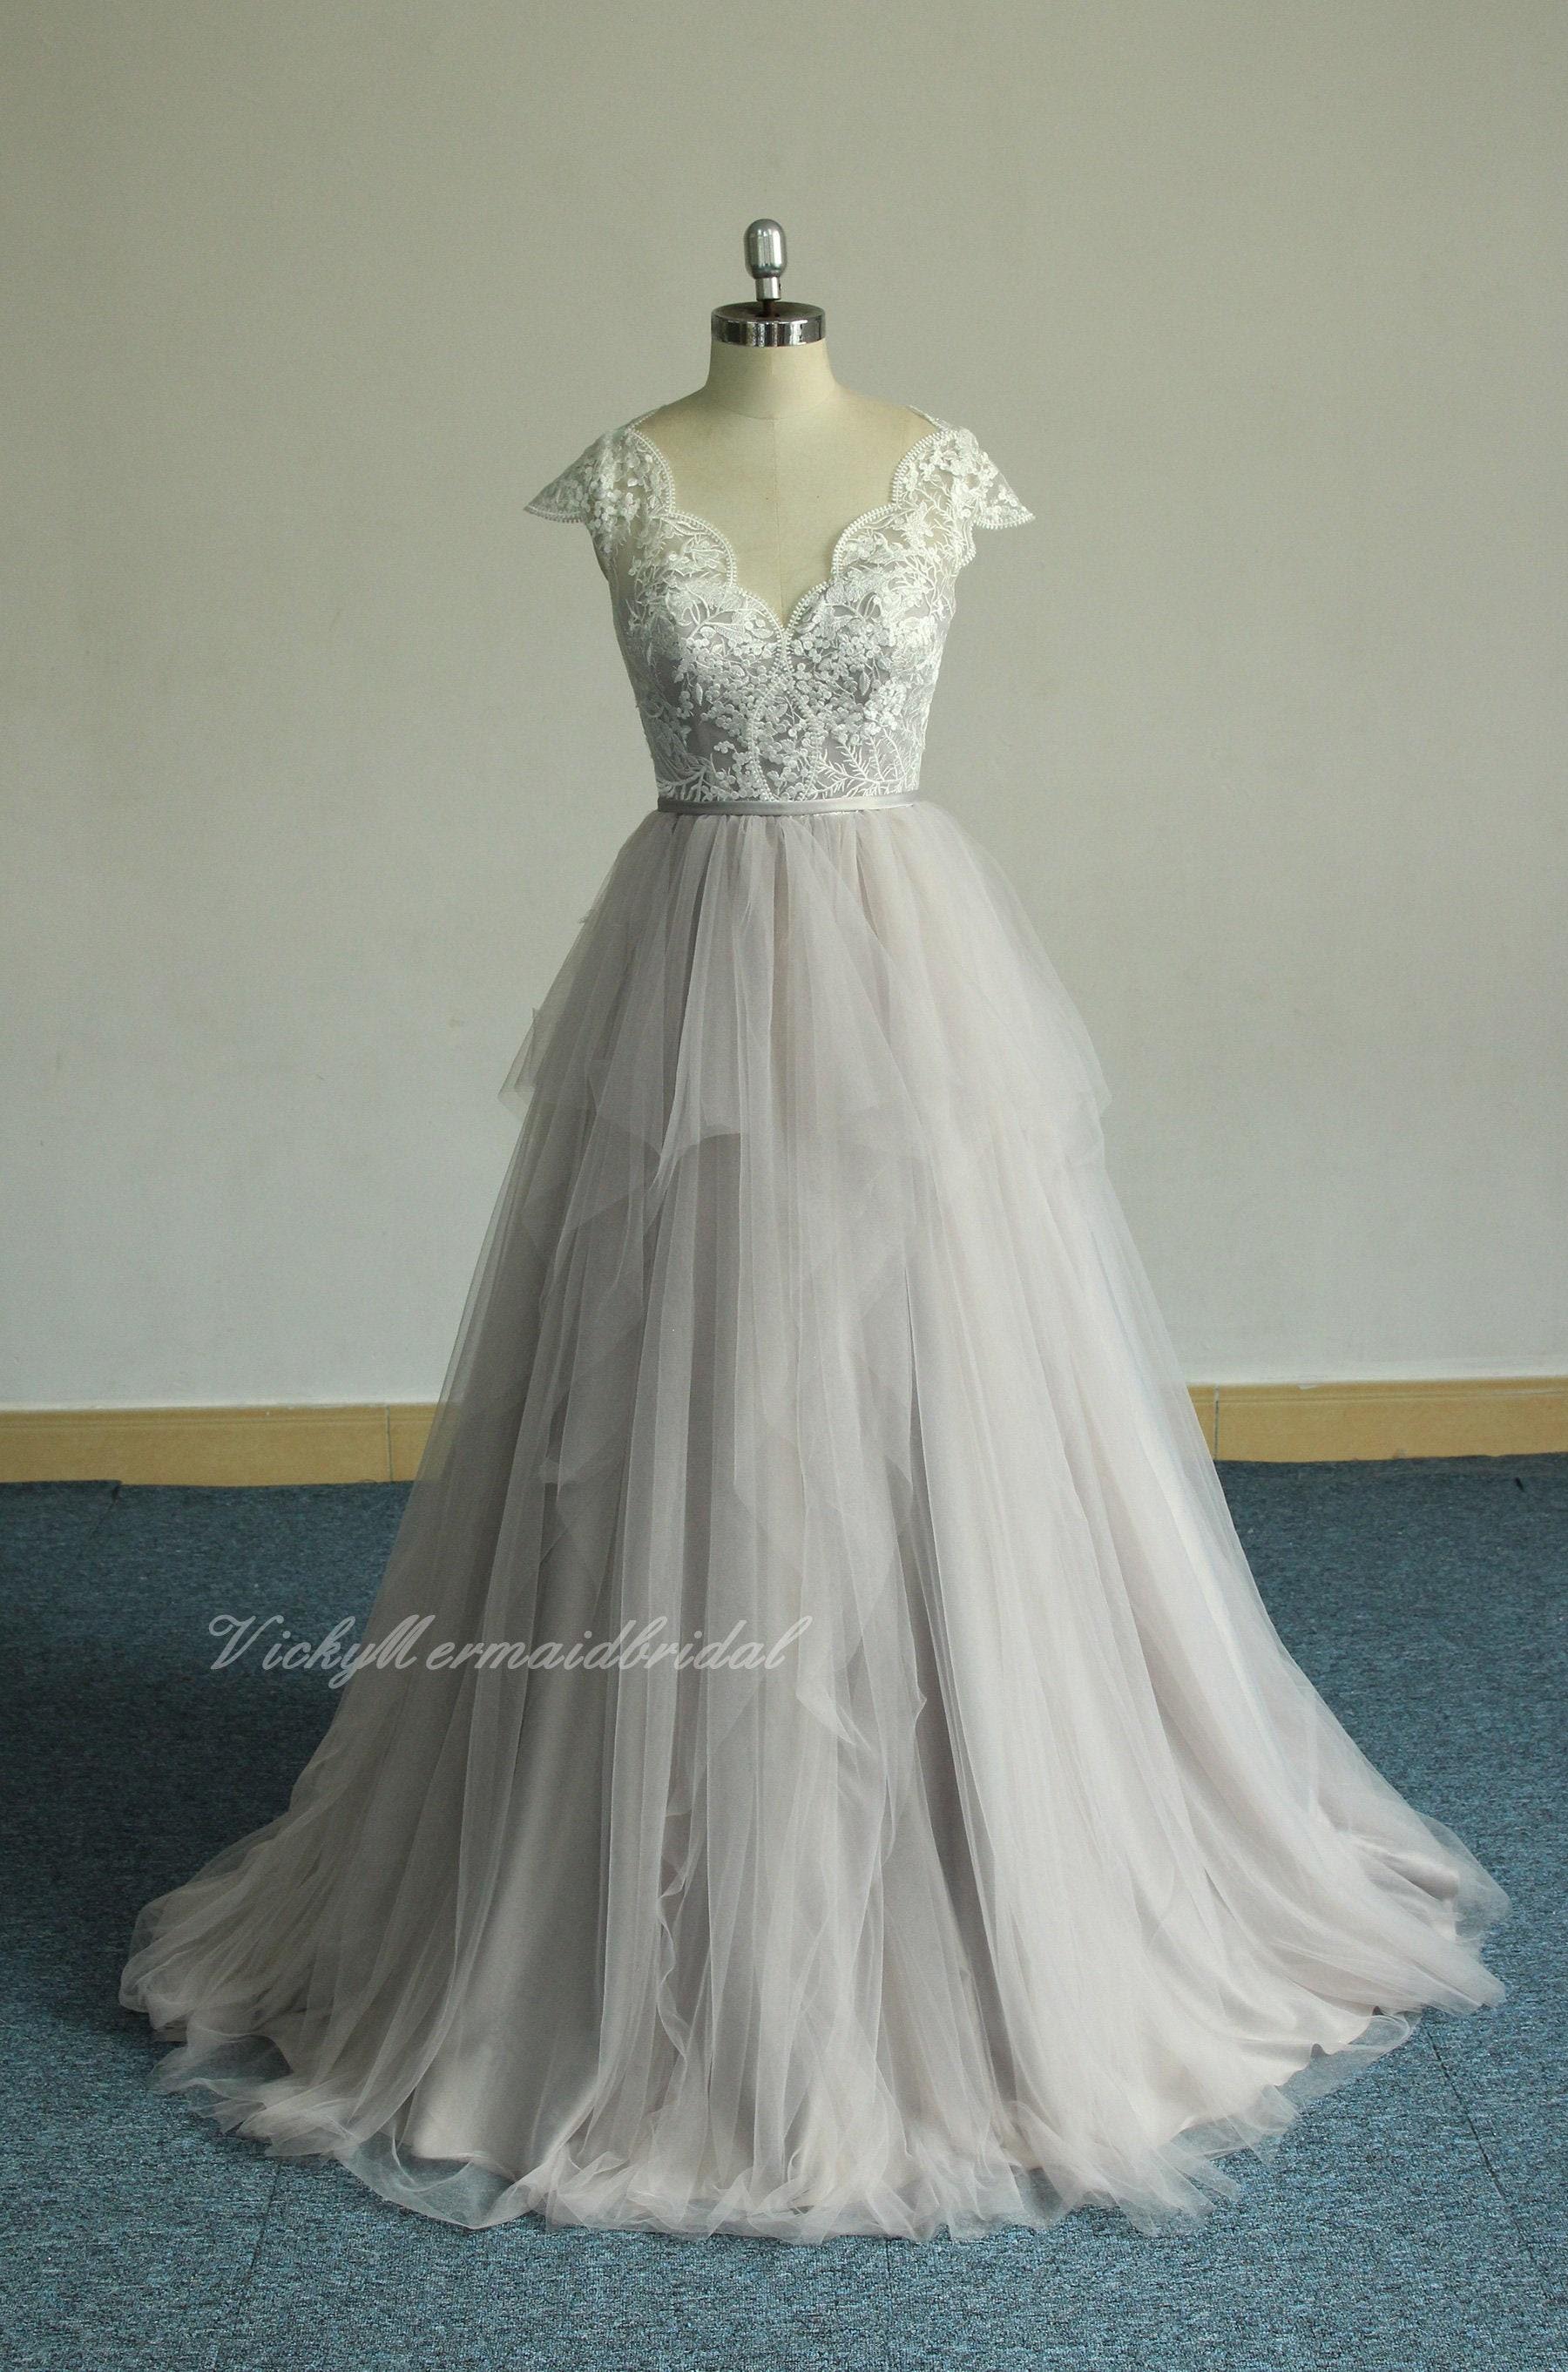 Romantic Bohemian Wedding Dresses.Romantic Bohemian Wedding Dress Scallop Neckline Outdoor Wedding Dress Gray Weddin Dress With Ruffled Skirt